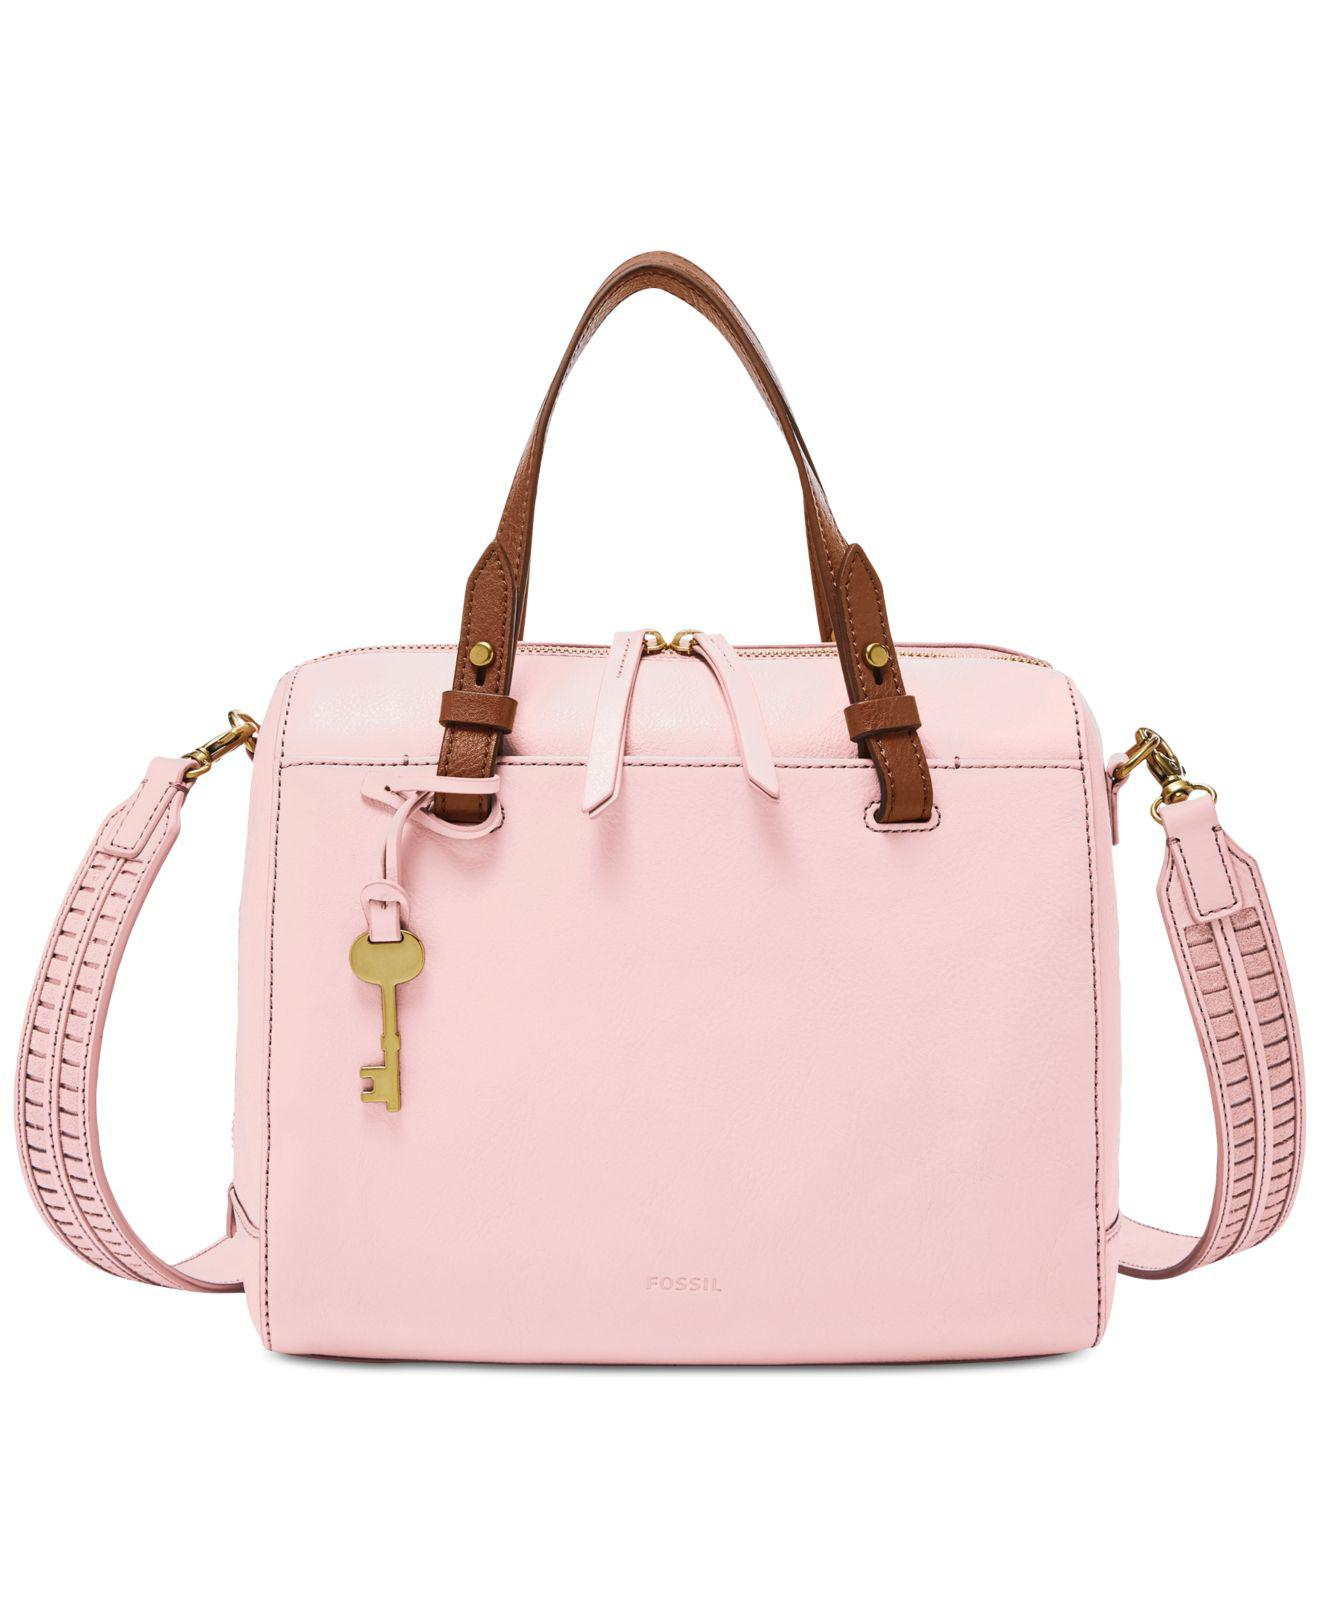 Fossil Rachel Satchel Handbag, Sea Pink